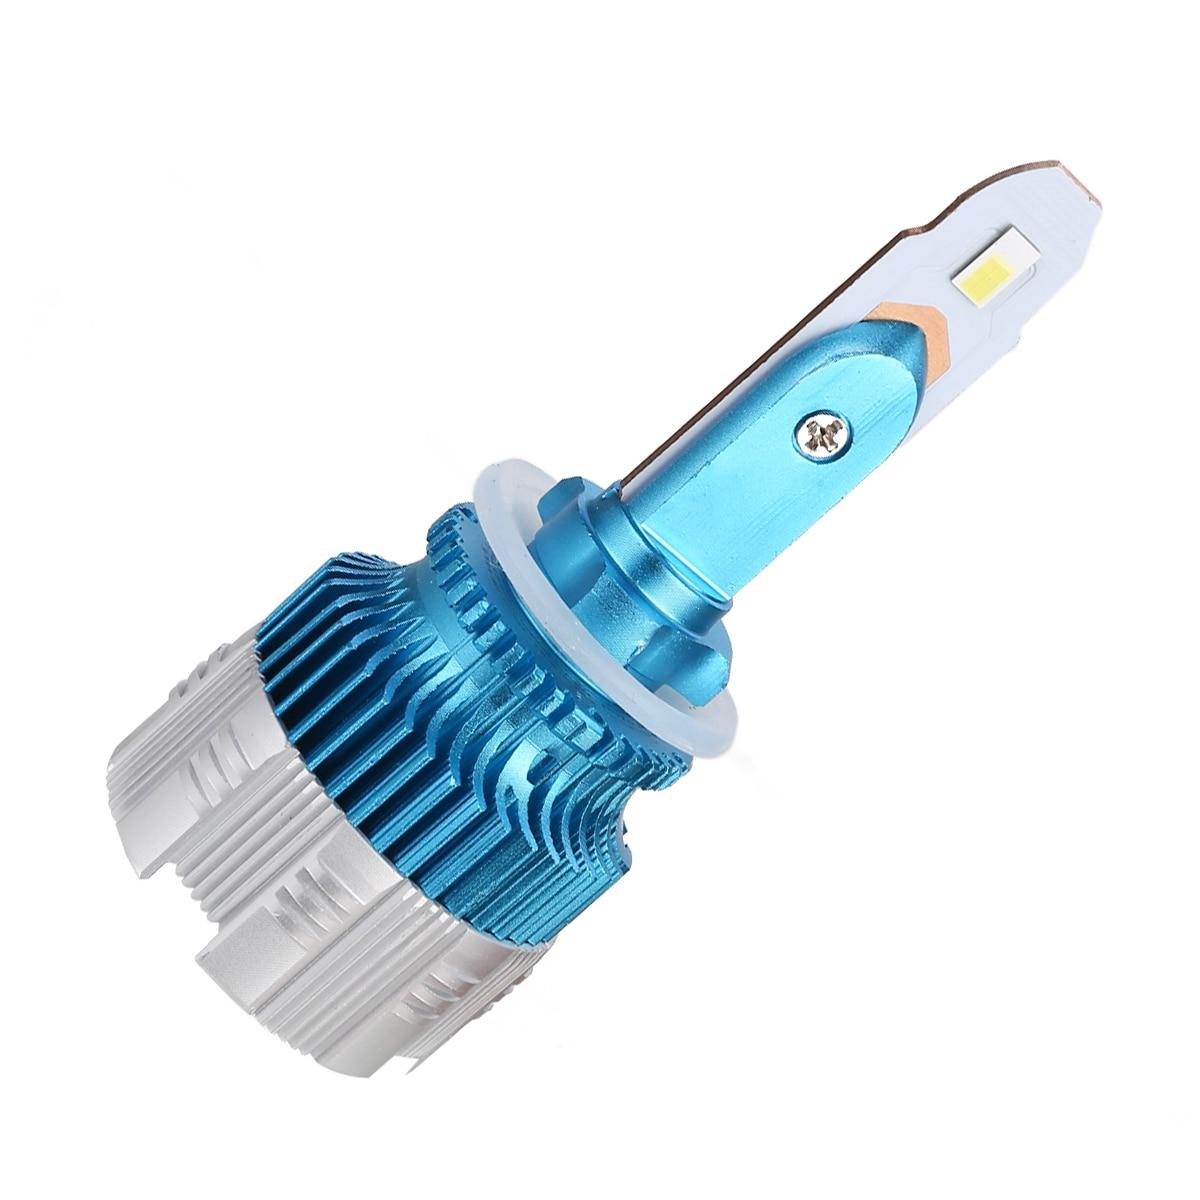 Car LED Headlamp 2pcs 6500K Waterproof LED Bulb 880 881 60W 3000lm LED Headlight Head Lamp High Brightness in Car Headlight Bulbs LED from Automobiles Motorcycles